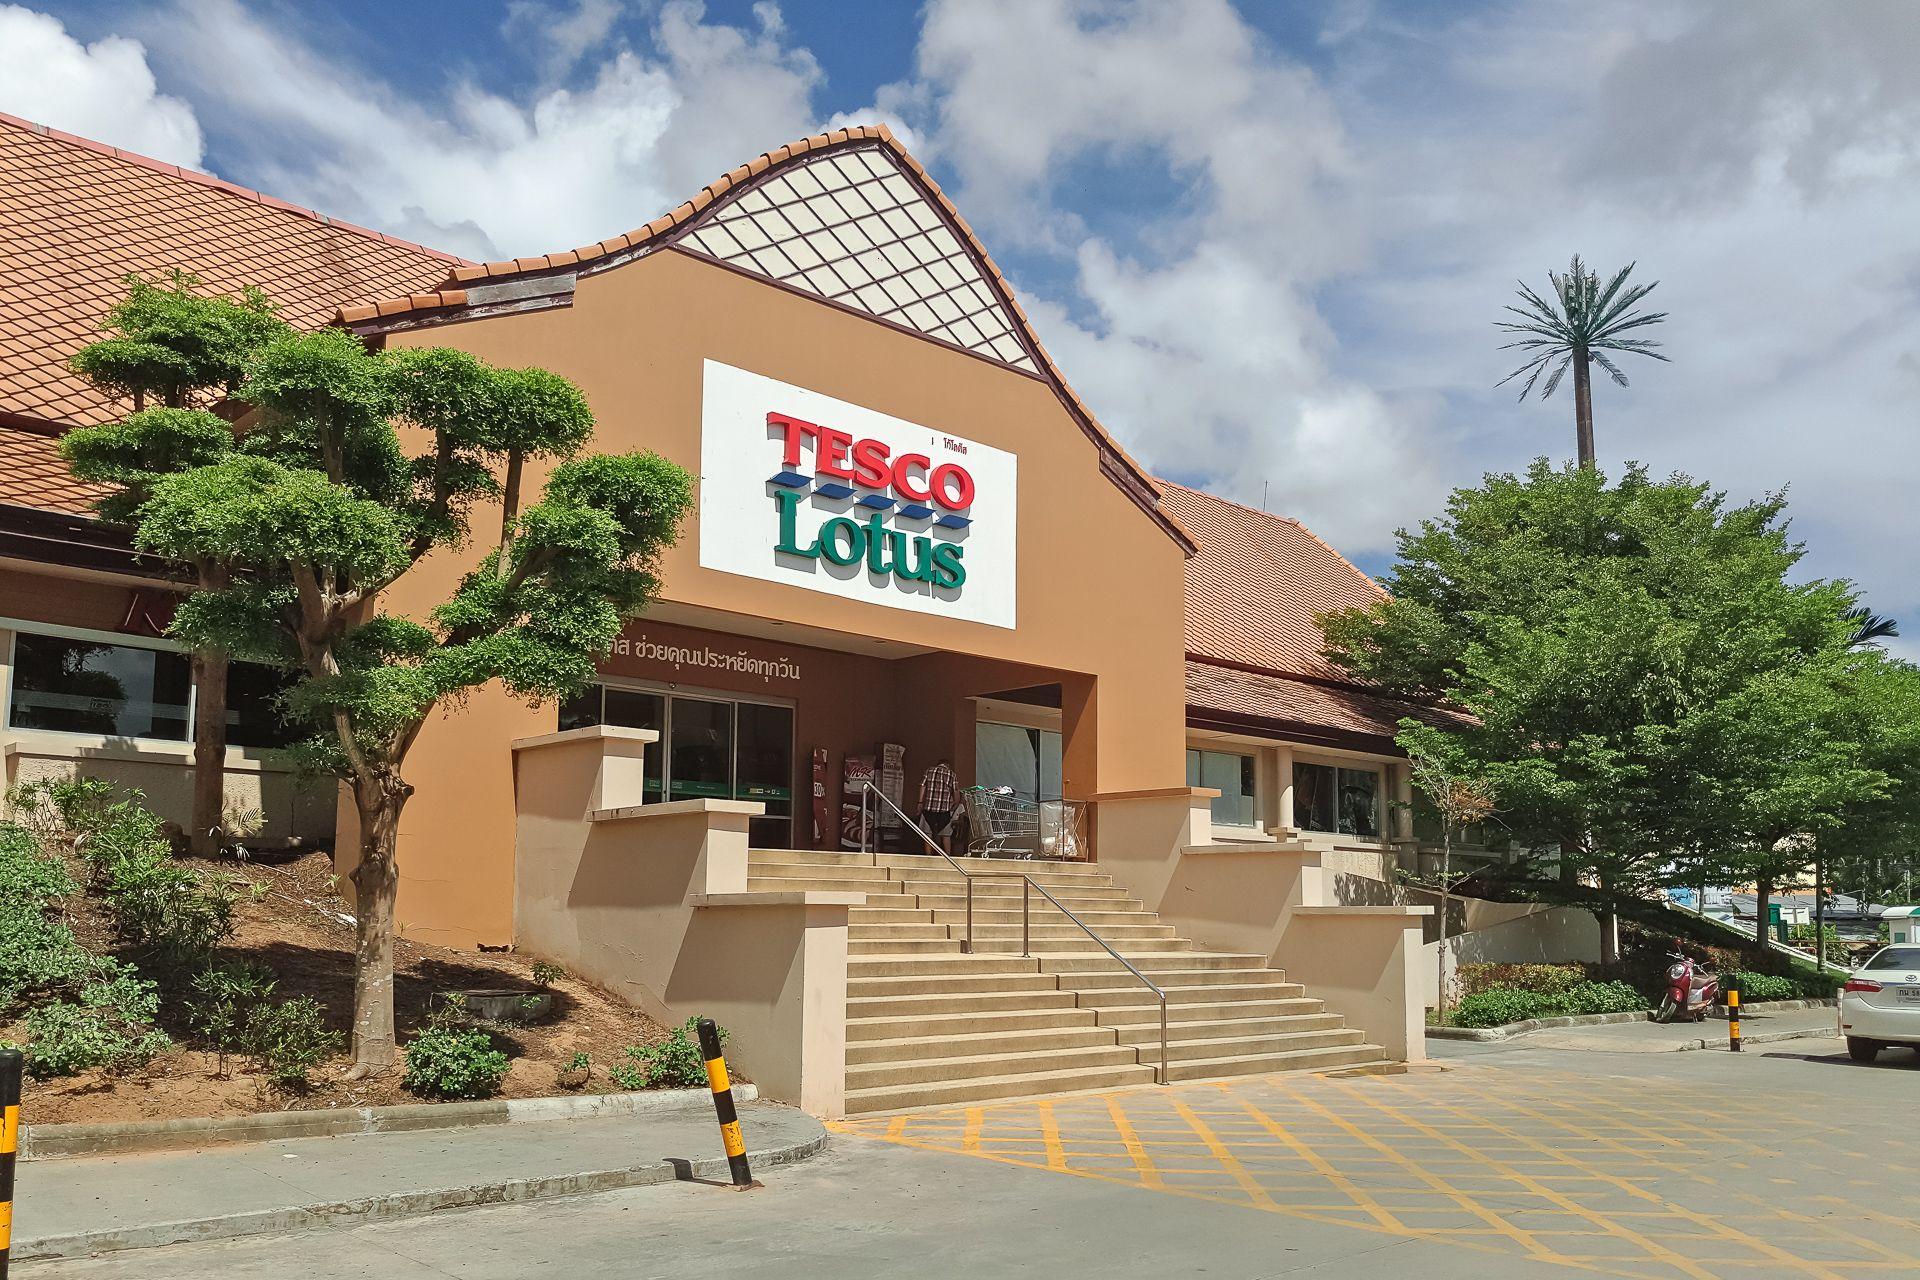 Теско, супермаркет, Тайланд, Таиланд, продукты, товары, цены, Теско лотус, Теско лотос, цены в Таиланде